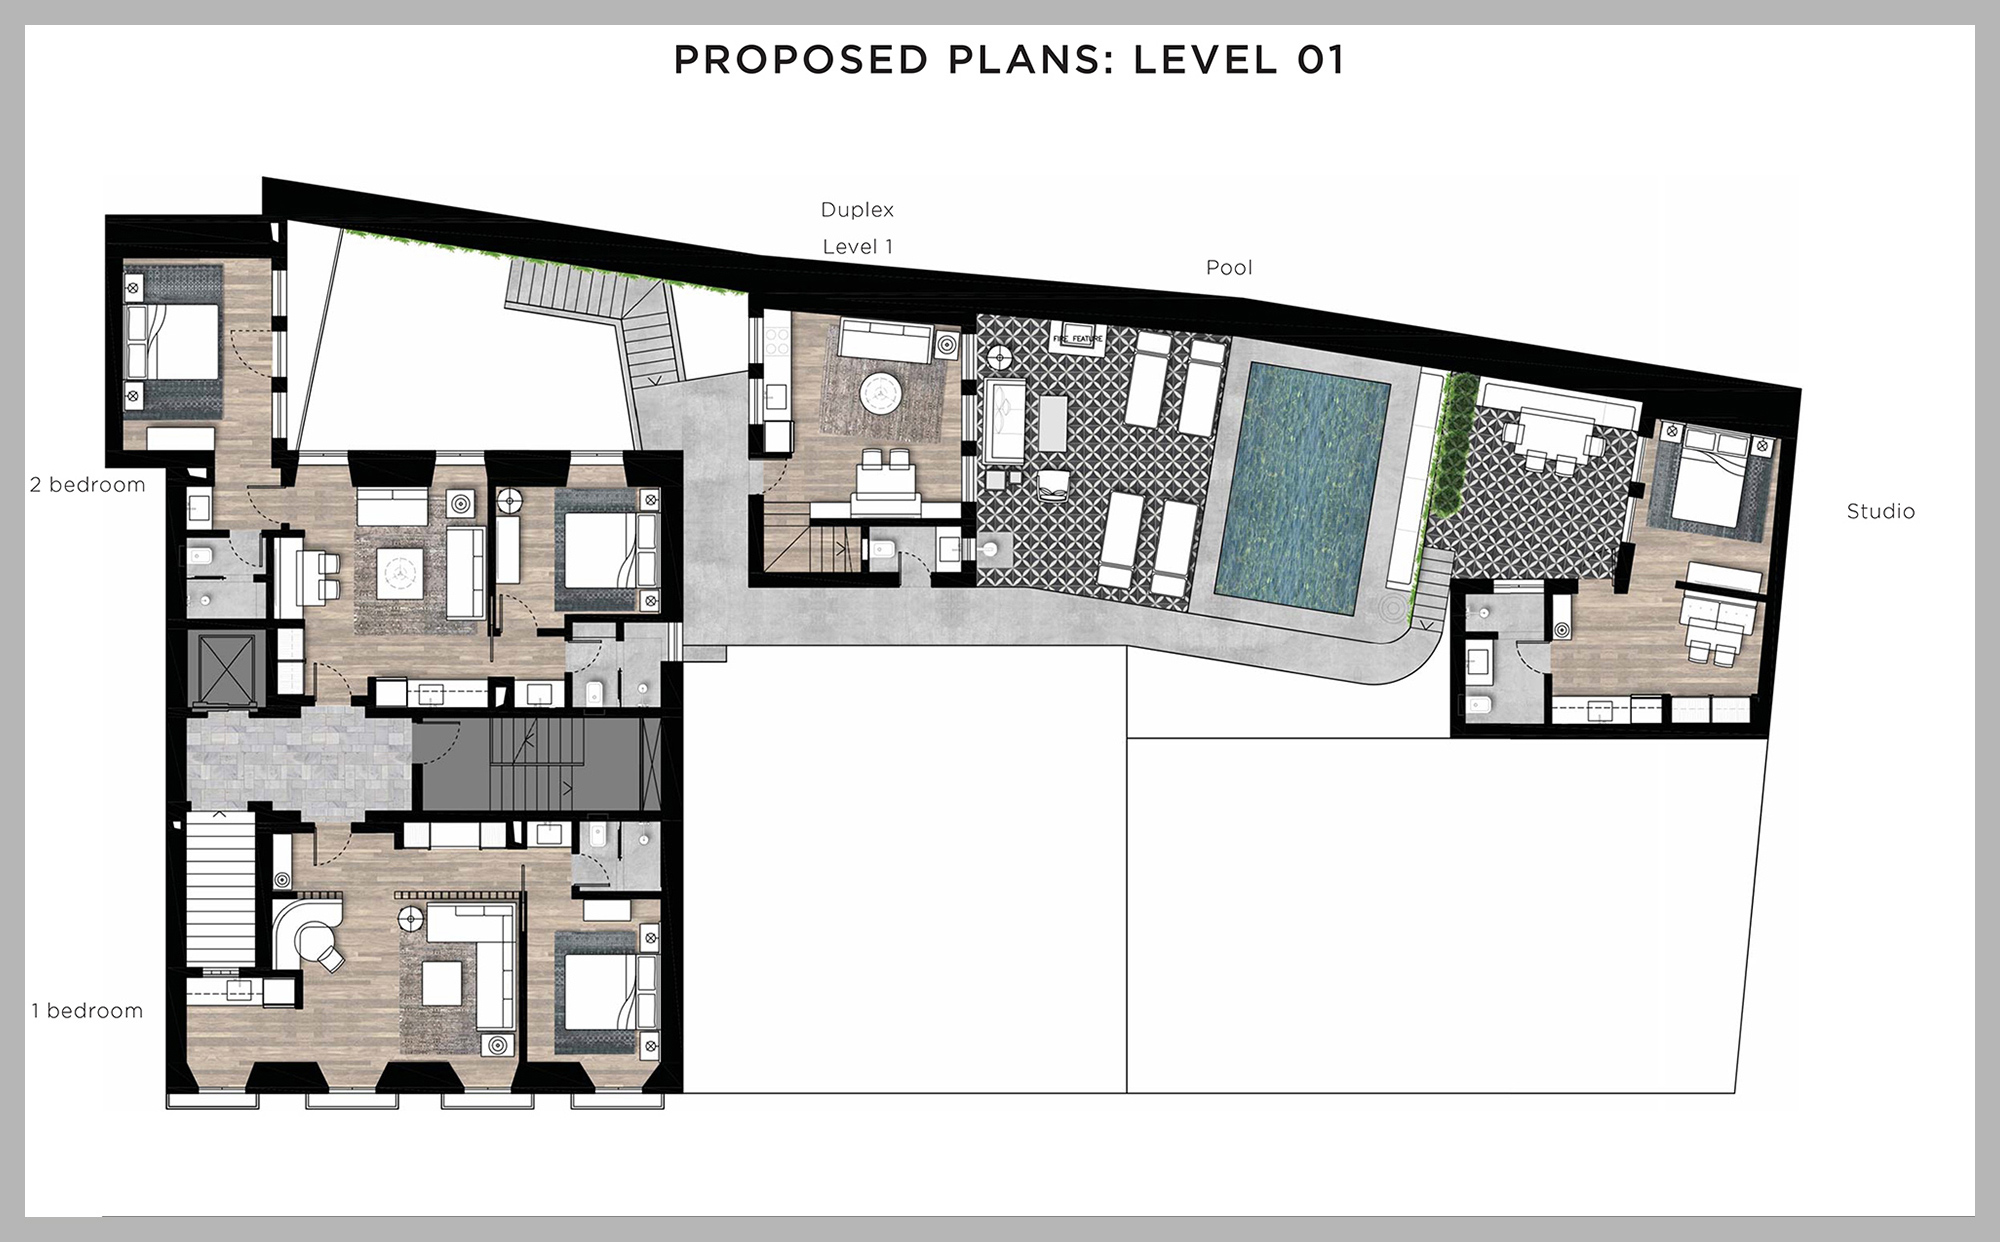 service-apartments-level-01.jpg